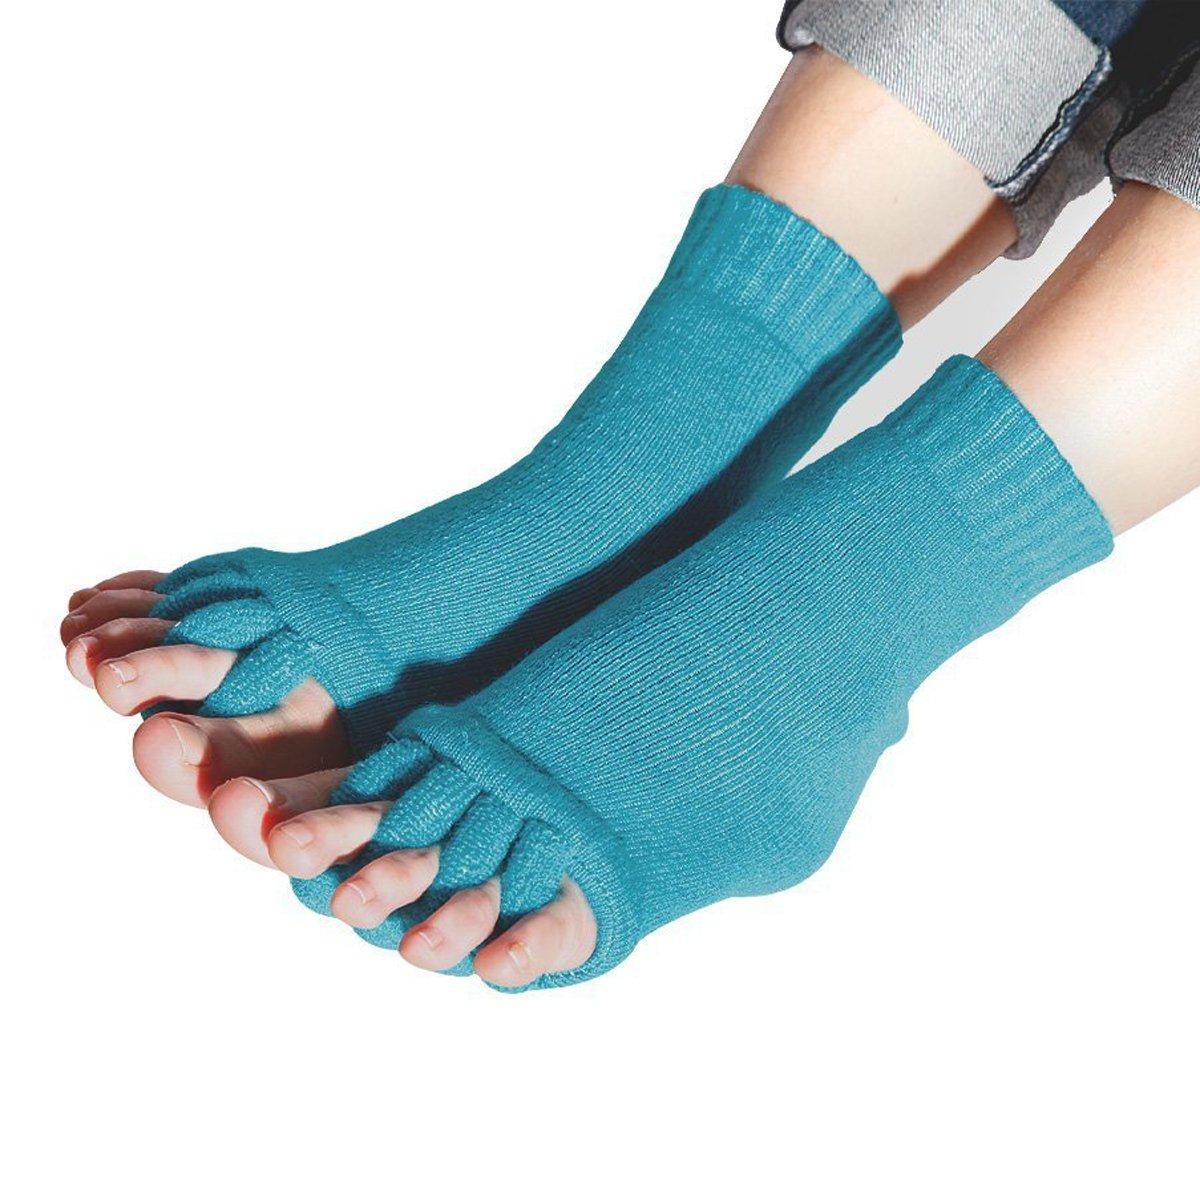 Yoga Shoes For Arthritis: Amazon.com : Toe Separators